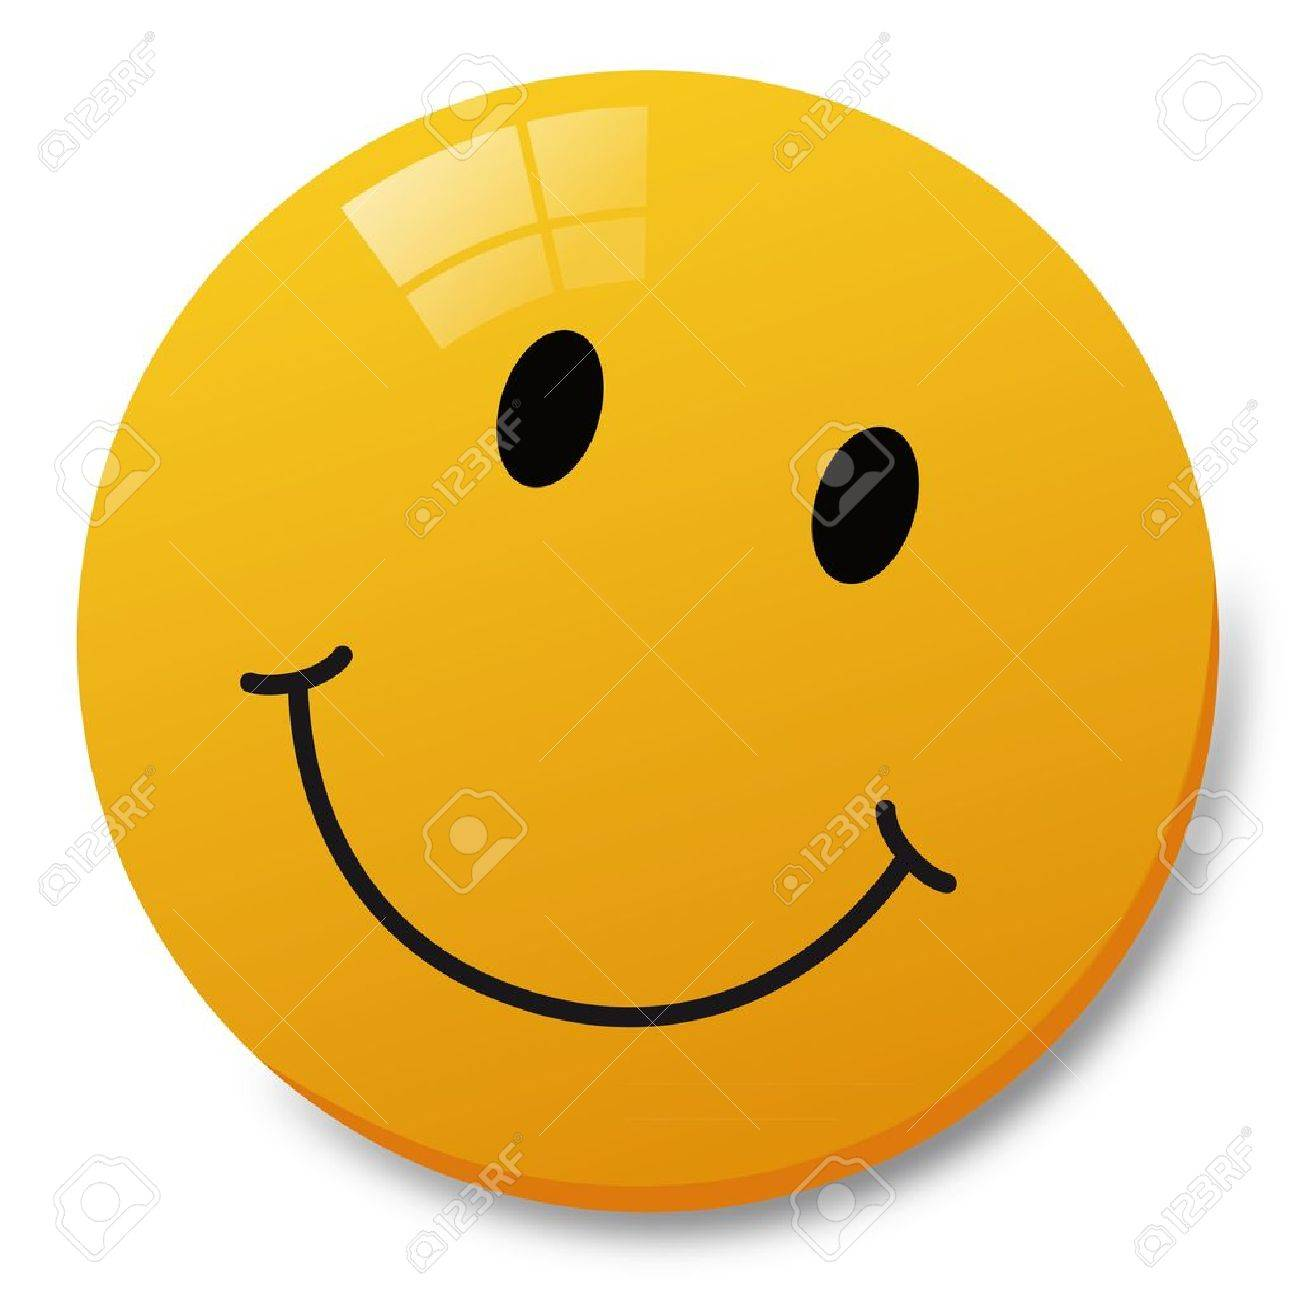 Funny Button - 9283499